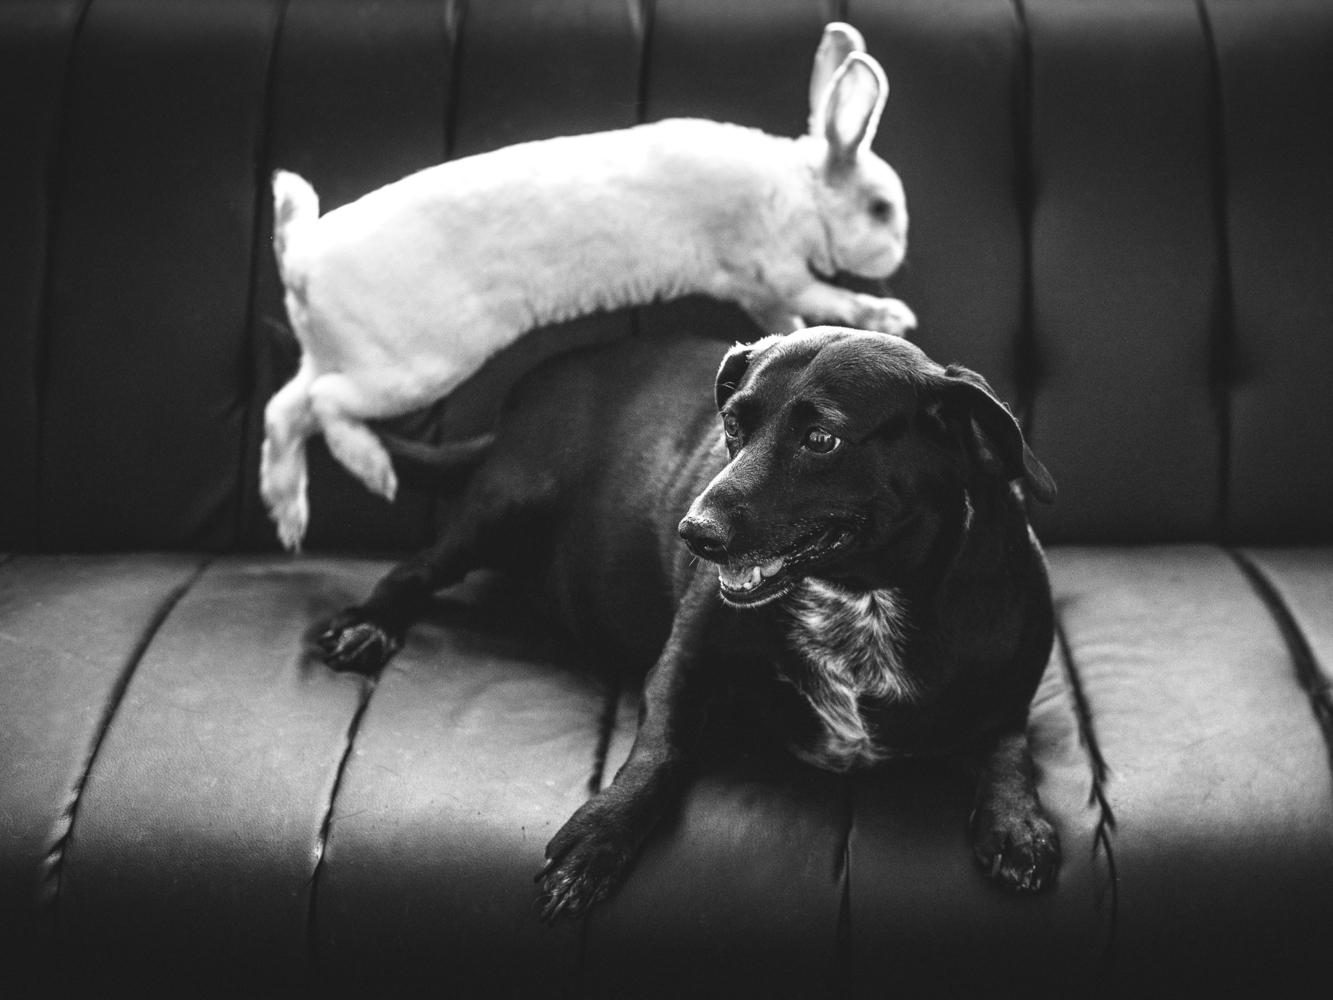 Rabbit standing on dog